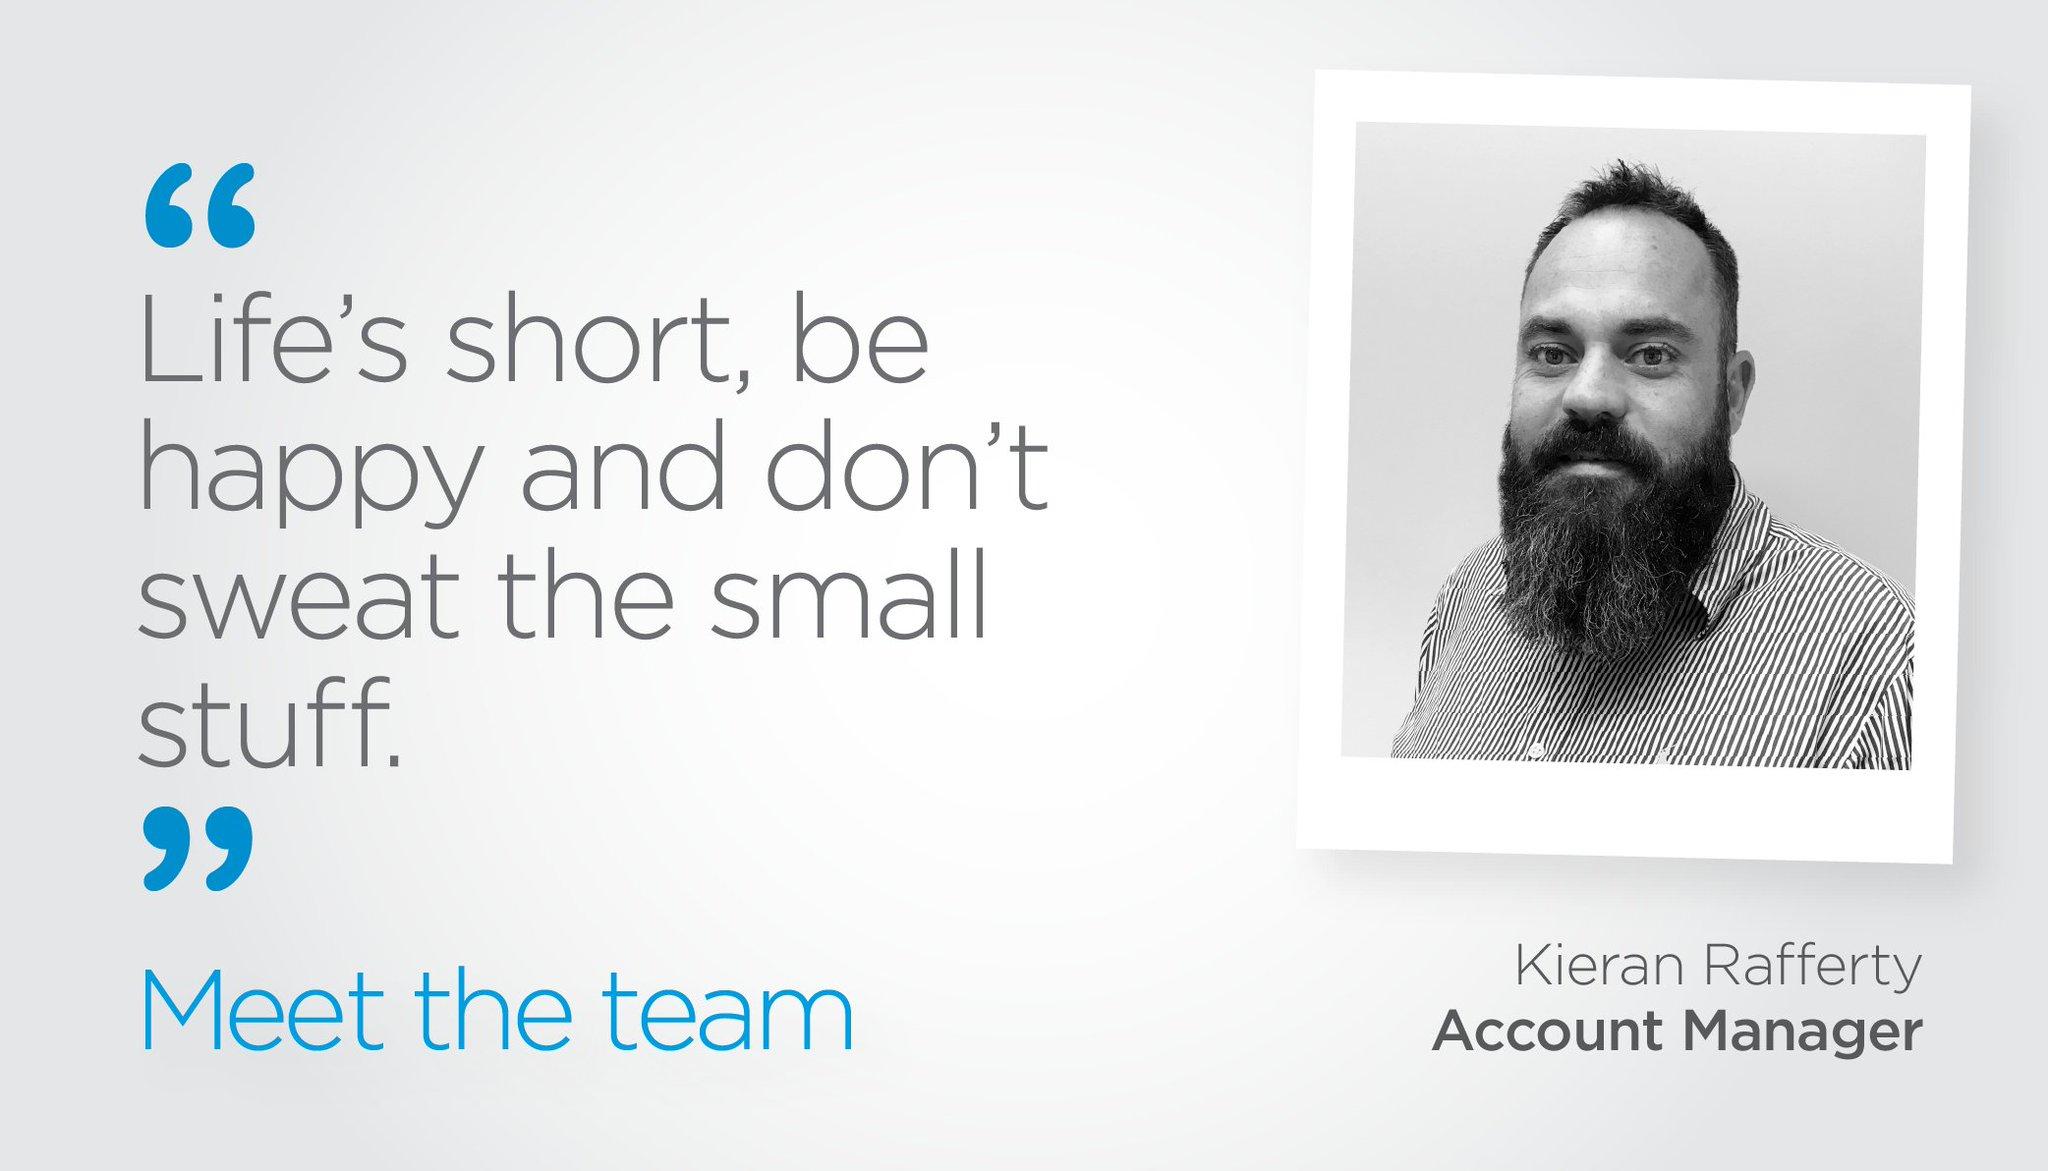 Meet The Team: Kieran